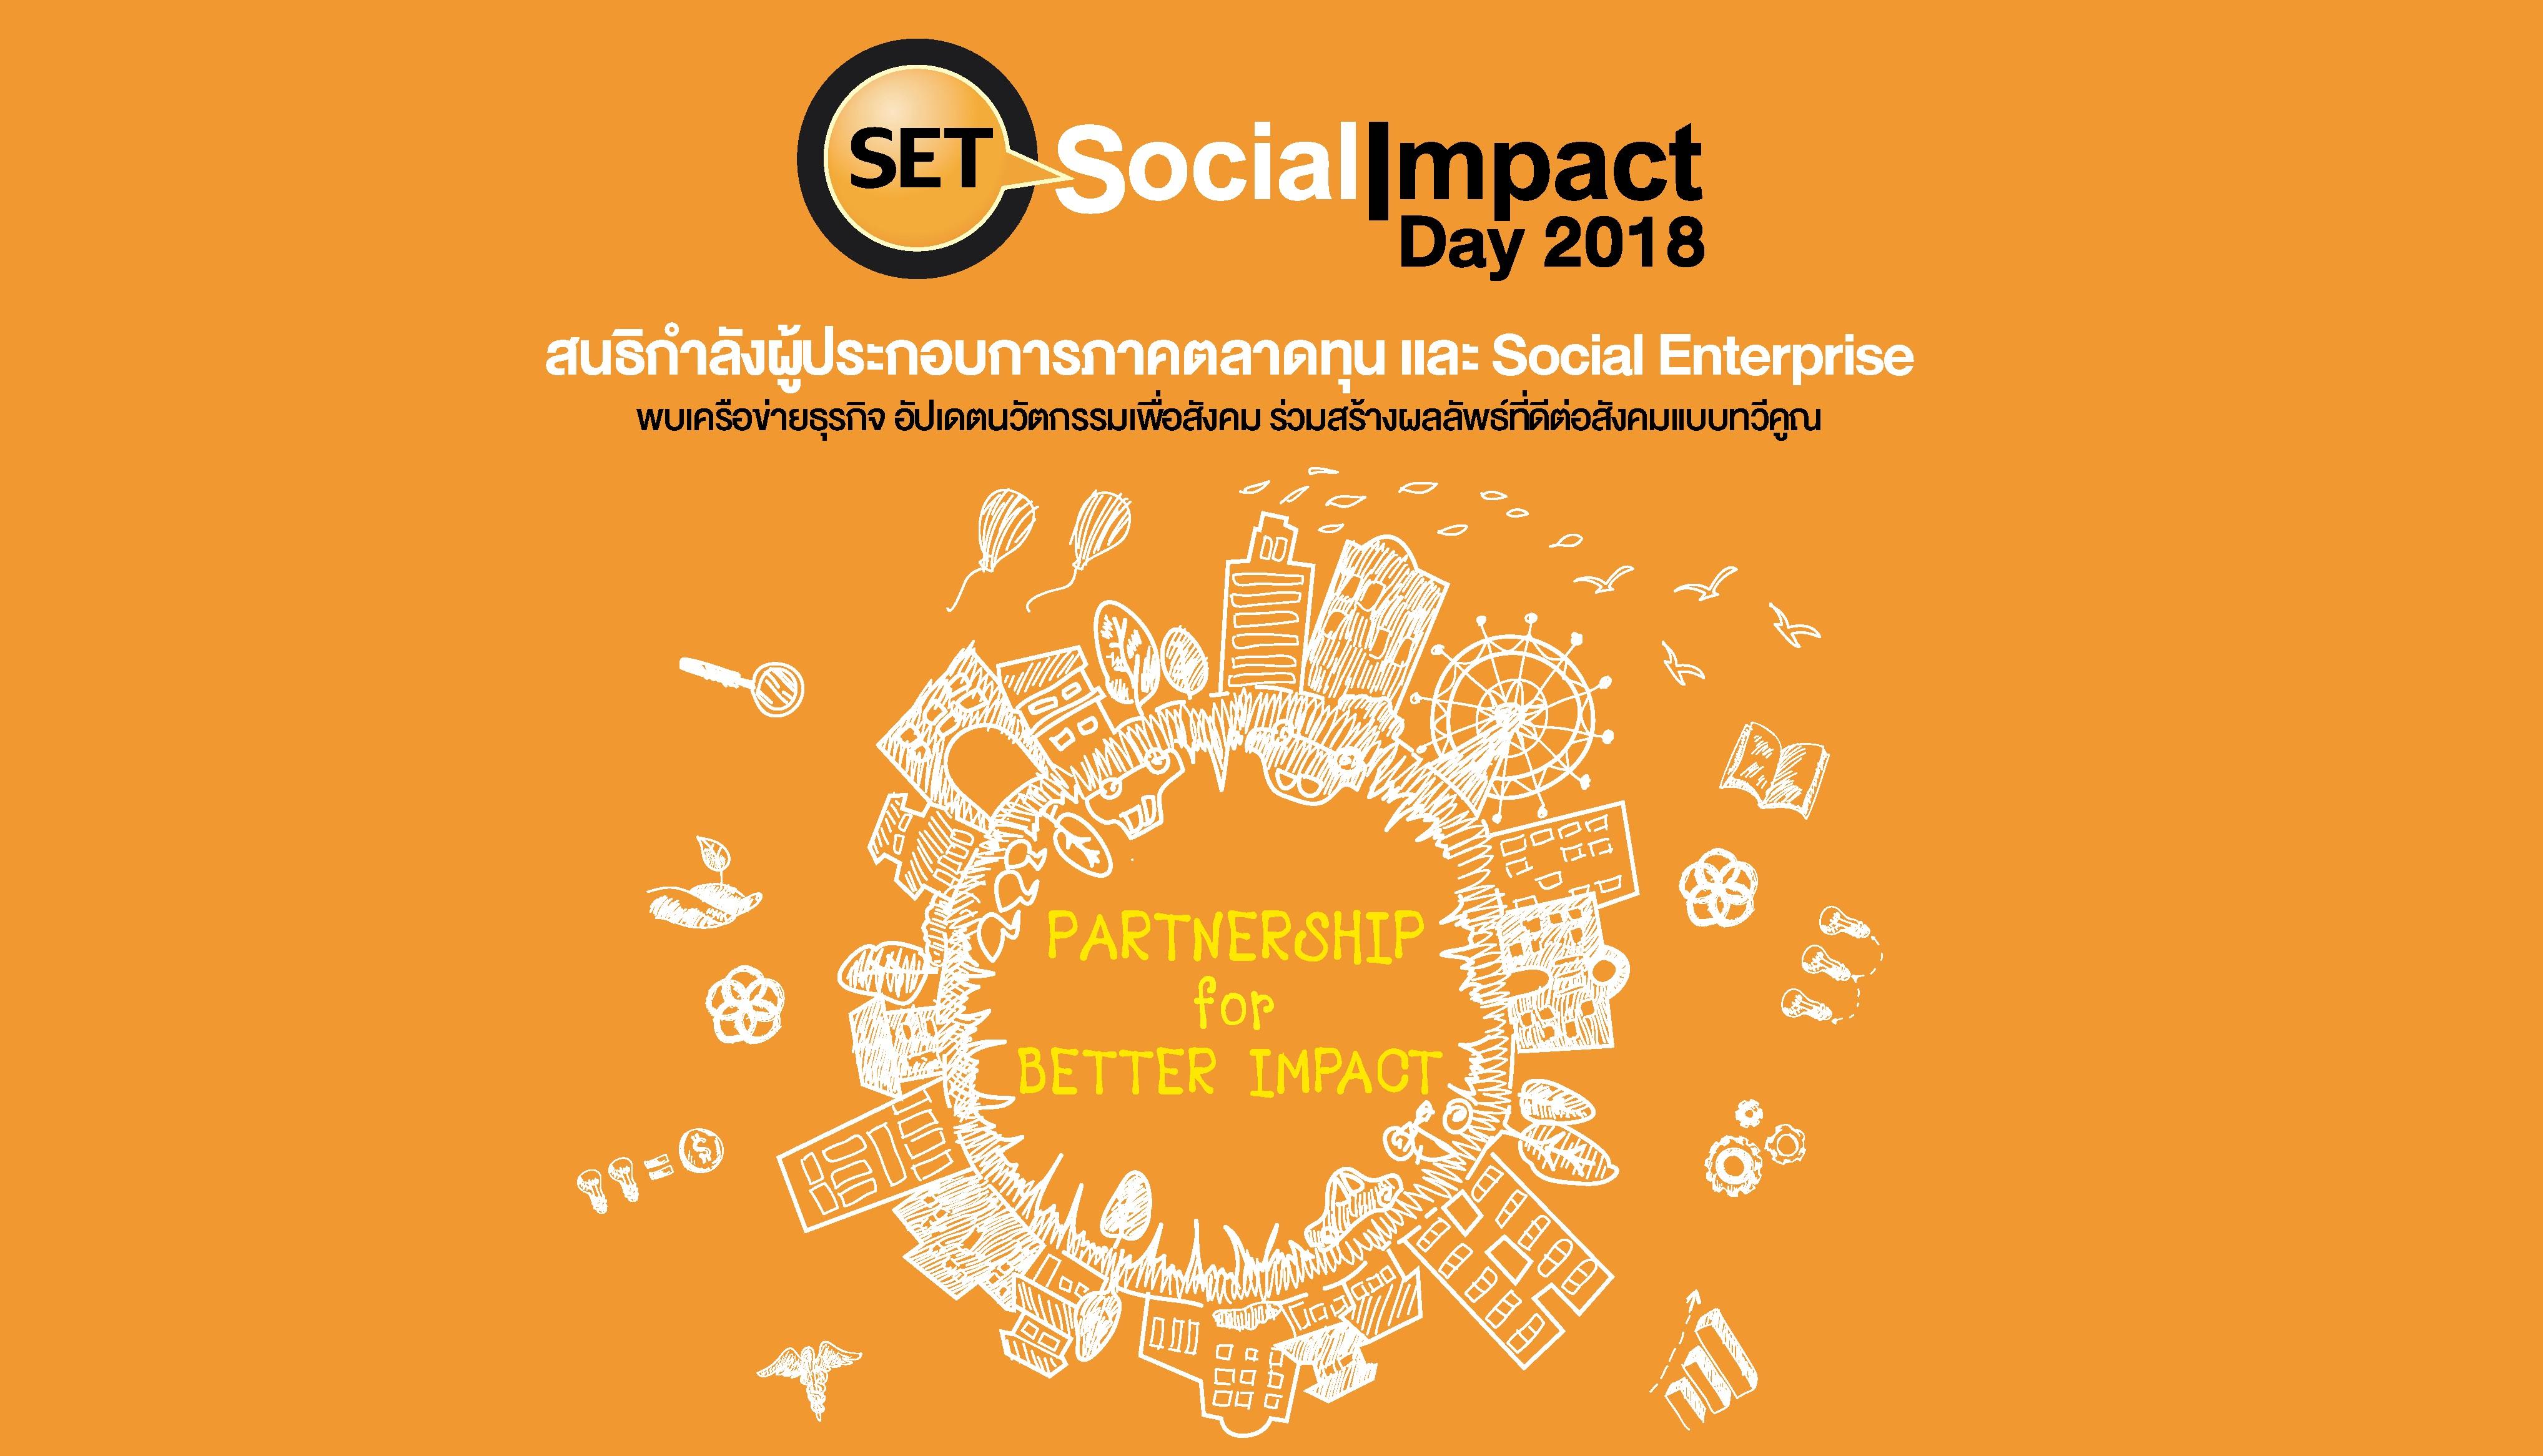 SET Social Impact Day 2018